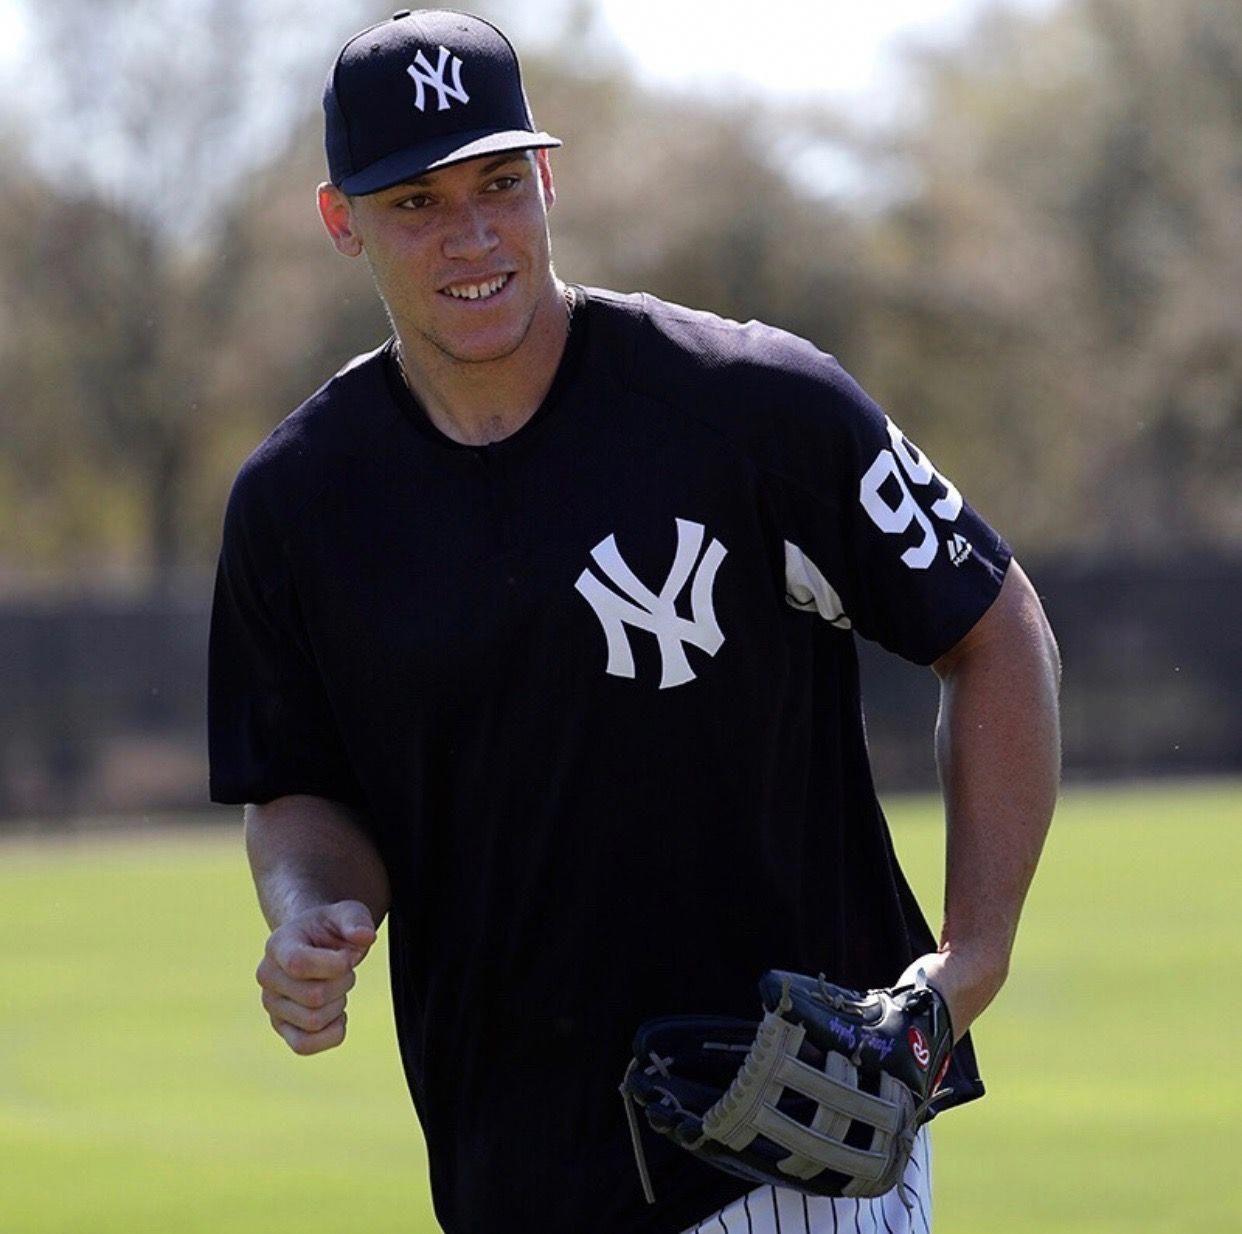 Discount Baseball Jerseys Cheapbaseballseats Baseballscorekeeping New York Yankees Baseball Espn Baseball Yankees Baseball